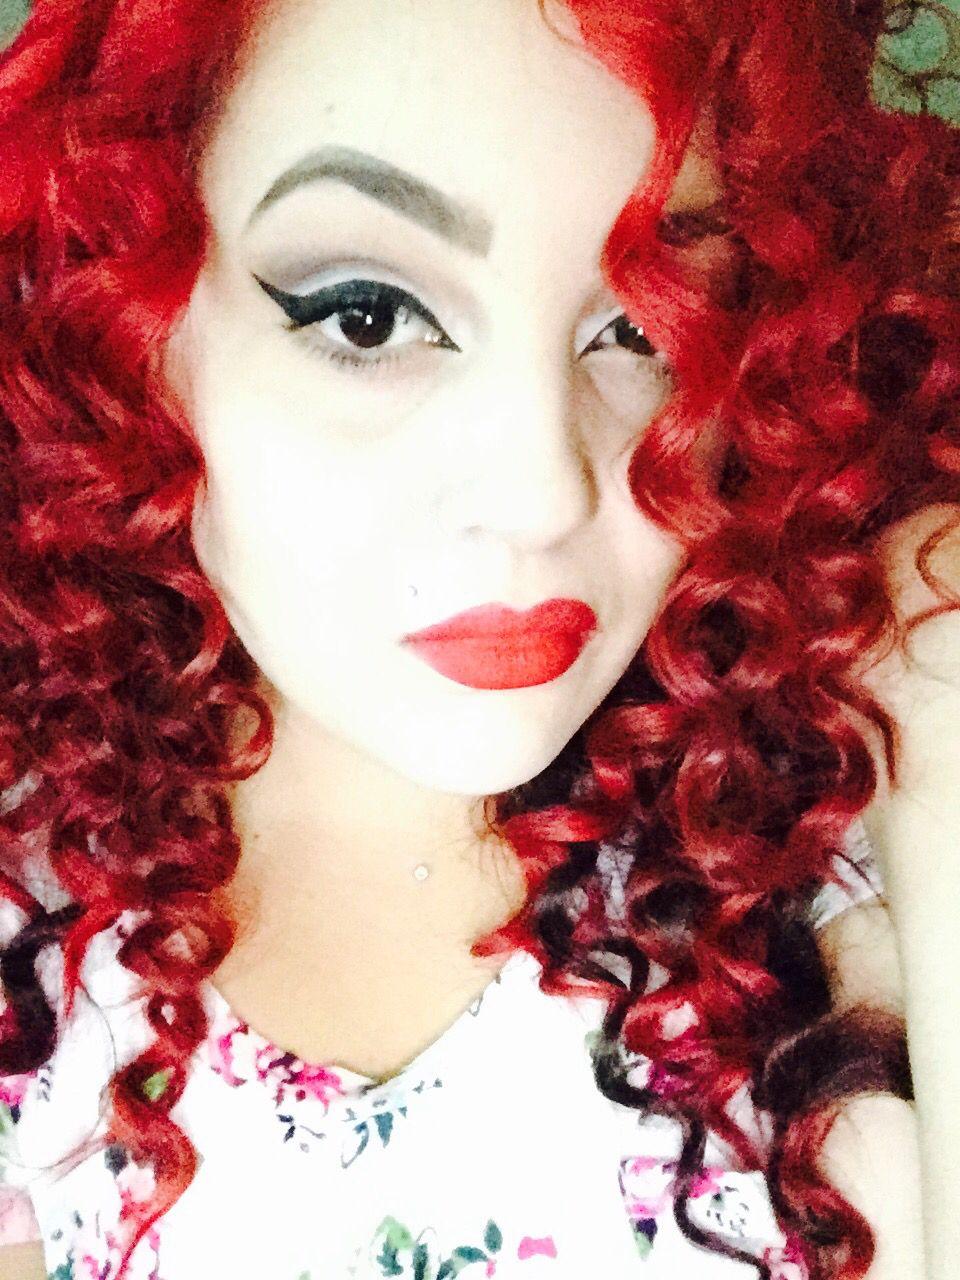 Red Hair Red Curlz Splat Crimson Obsession Mac Rubywoo Anastasia Dipbrow Dark Brown Splat Crimson Obsession Red Hair Splat Hair Color